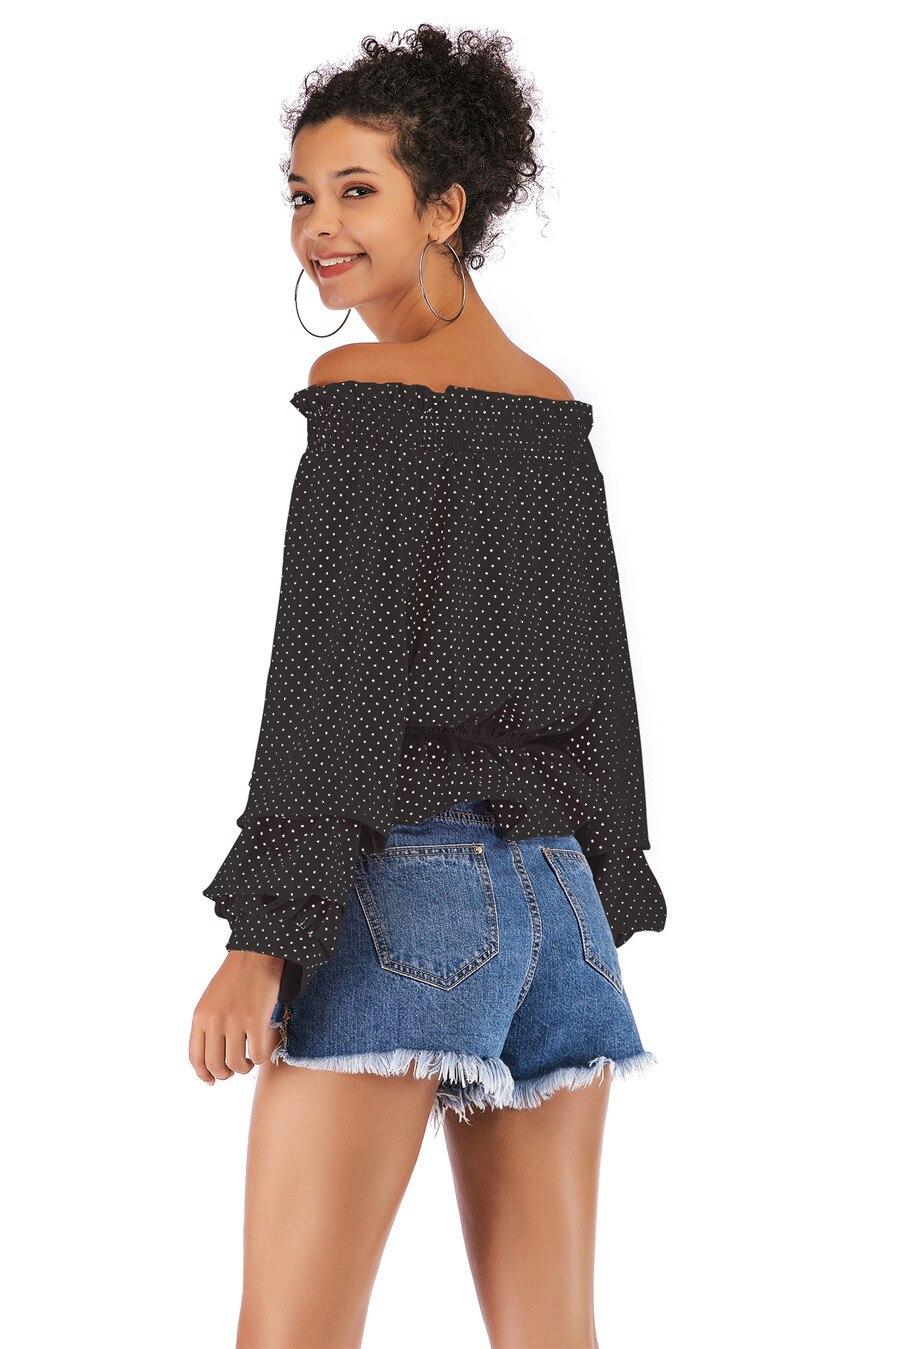 Gladiolus Chiffon Blouse Women 2019 Spring Autumn Long Sleeve Polka Dot Off Shoulder Sexy Blouses Women Shirts Ruffles Blusas (16)